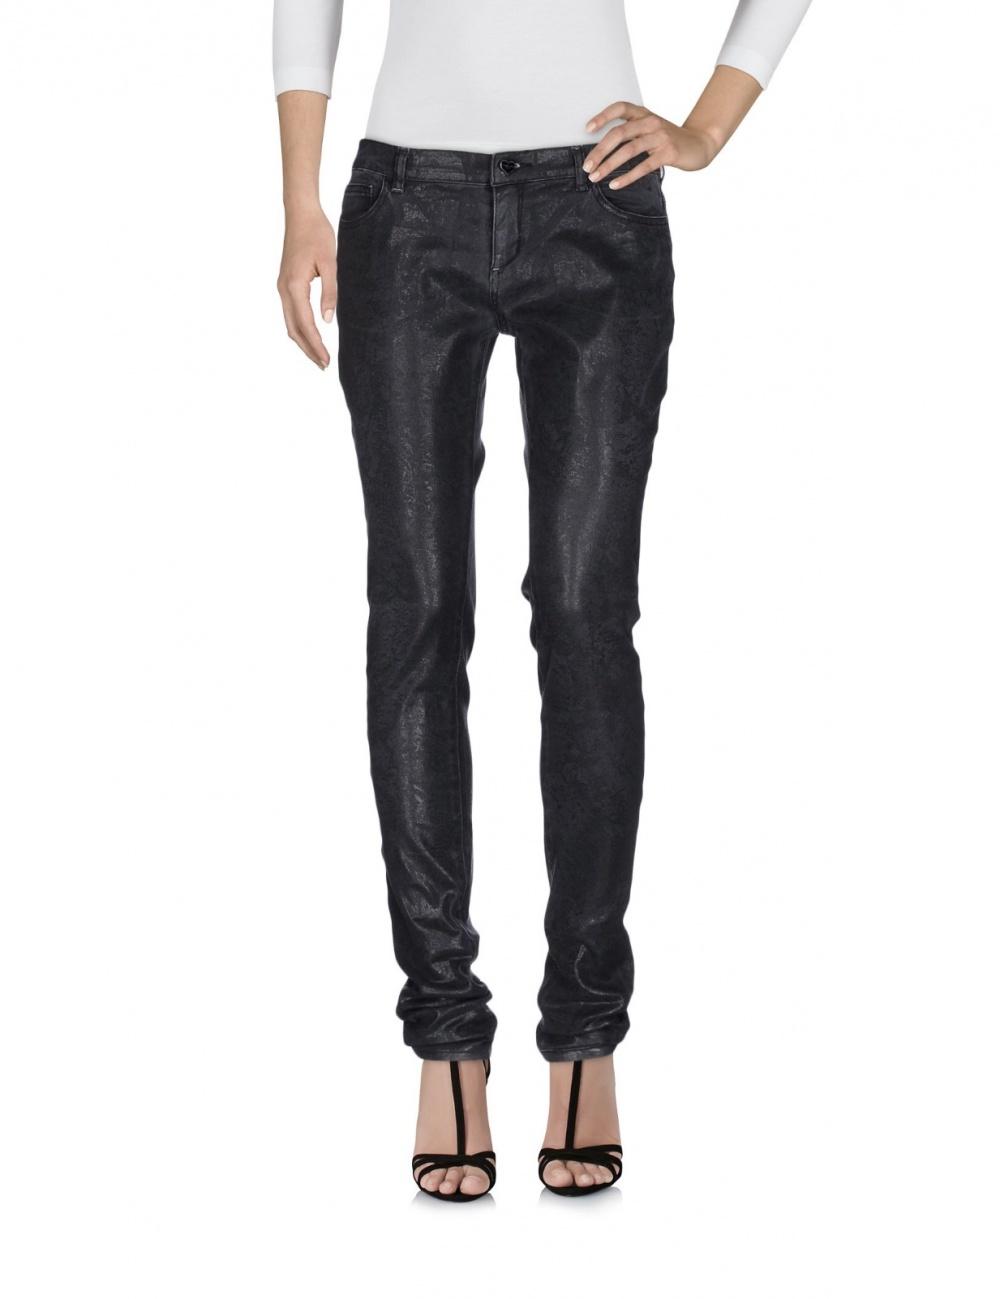 Джинсы Twin Set Jeans 26р